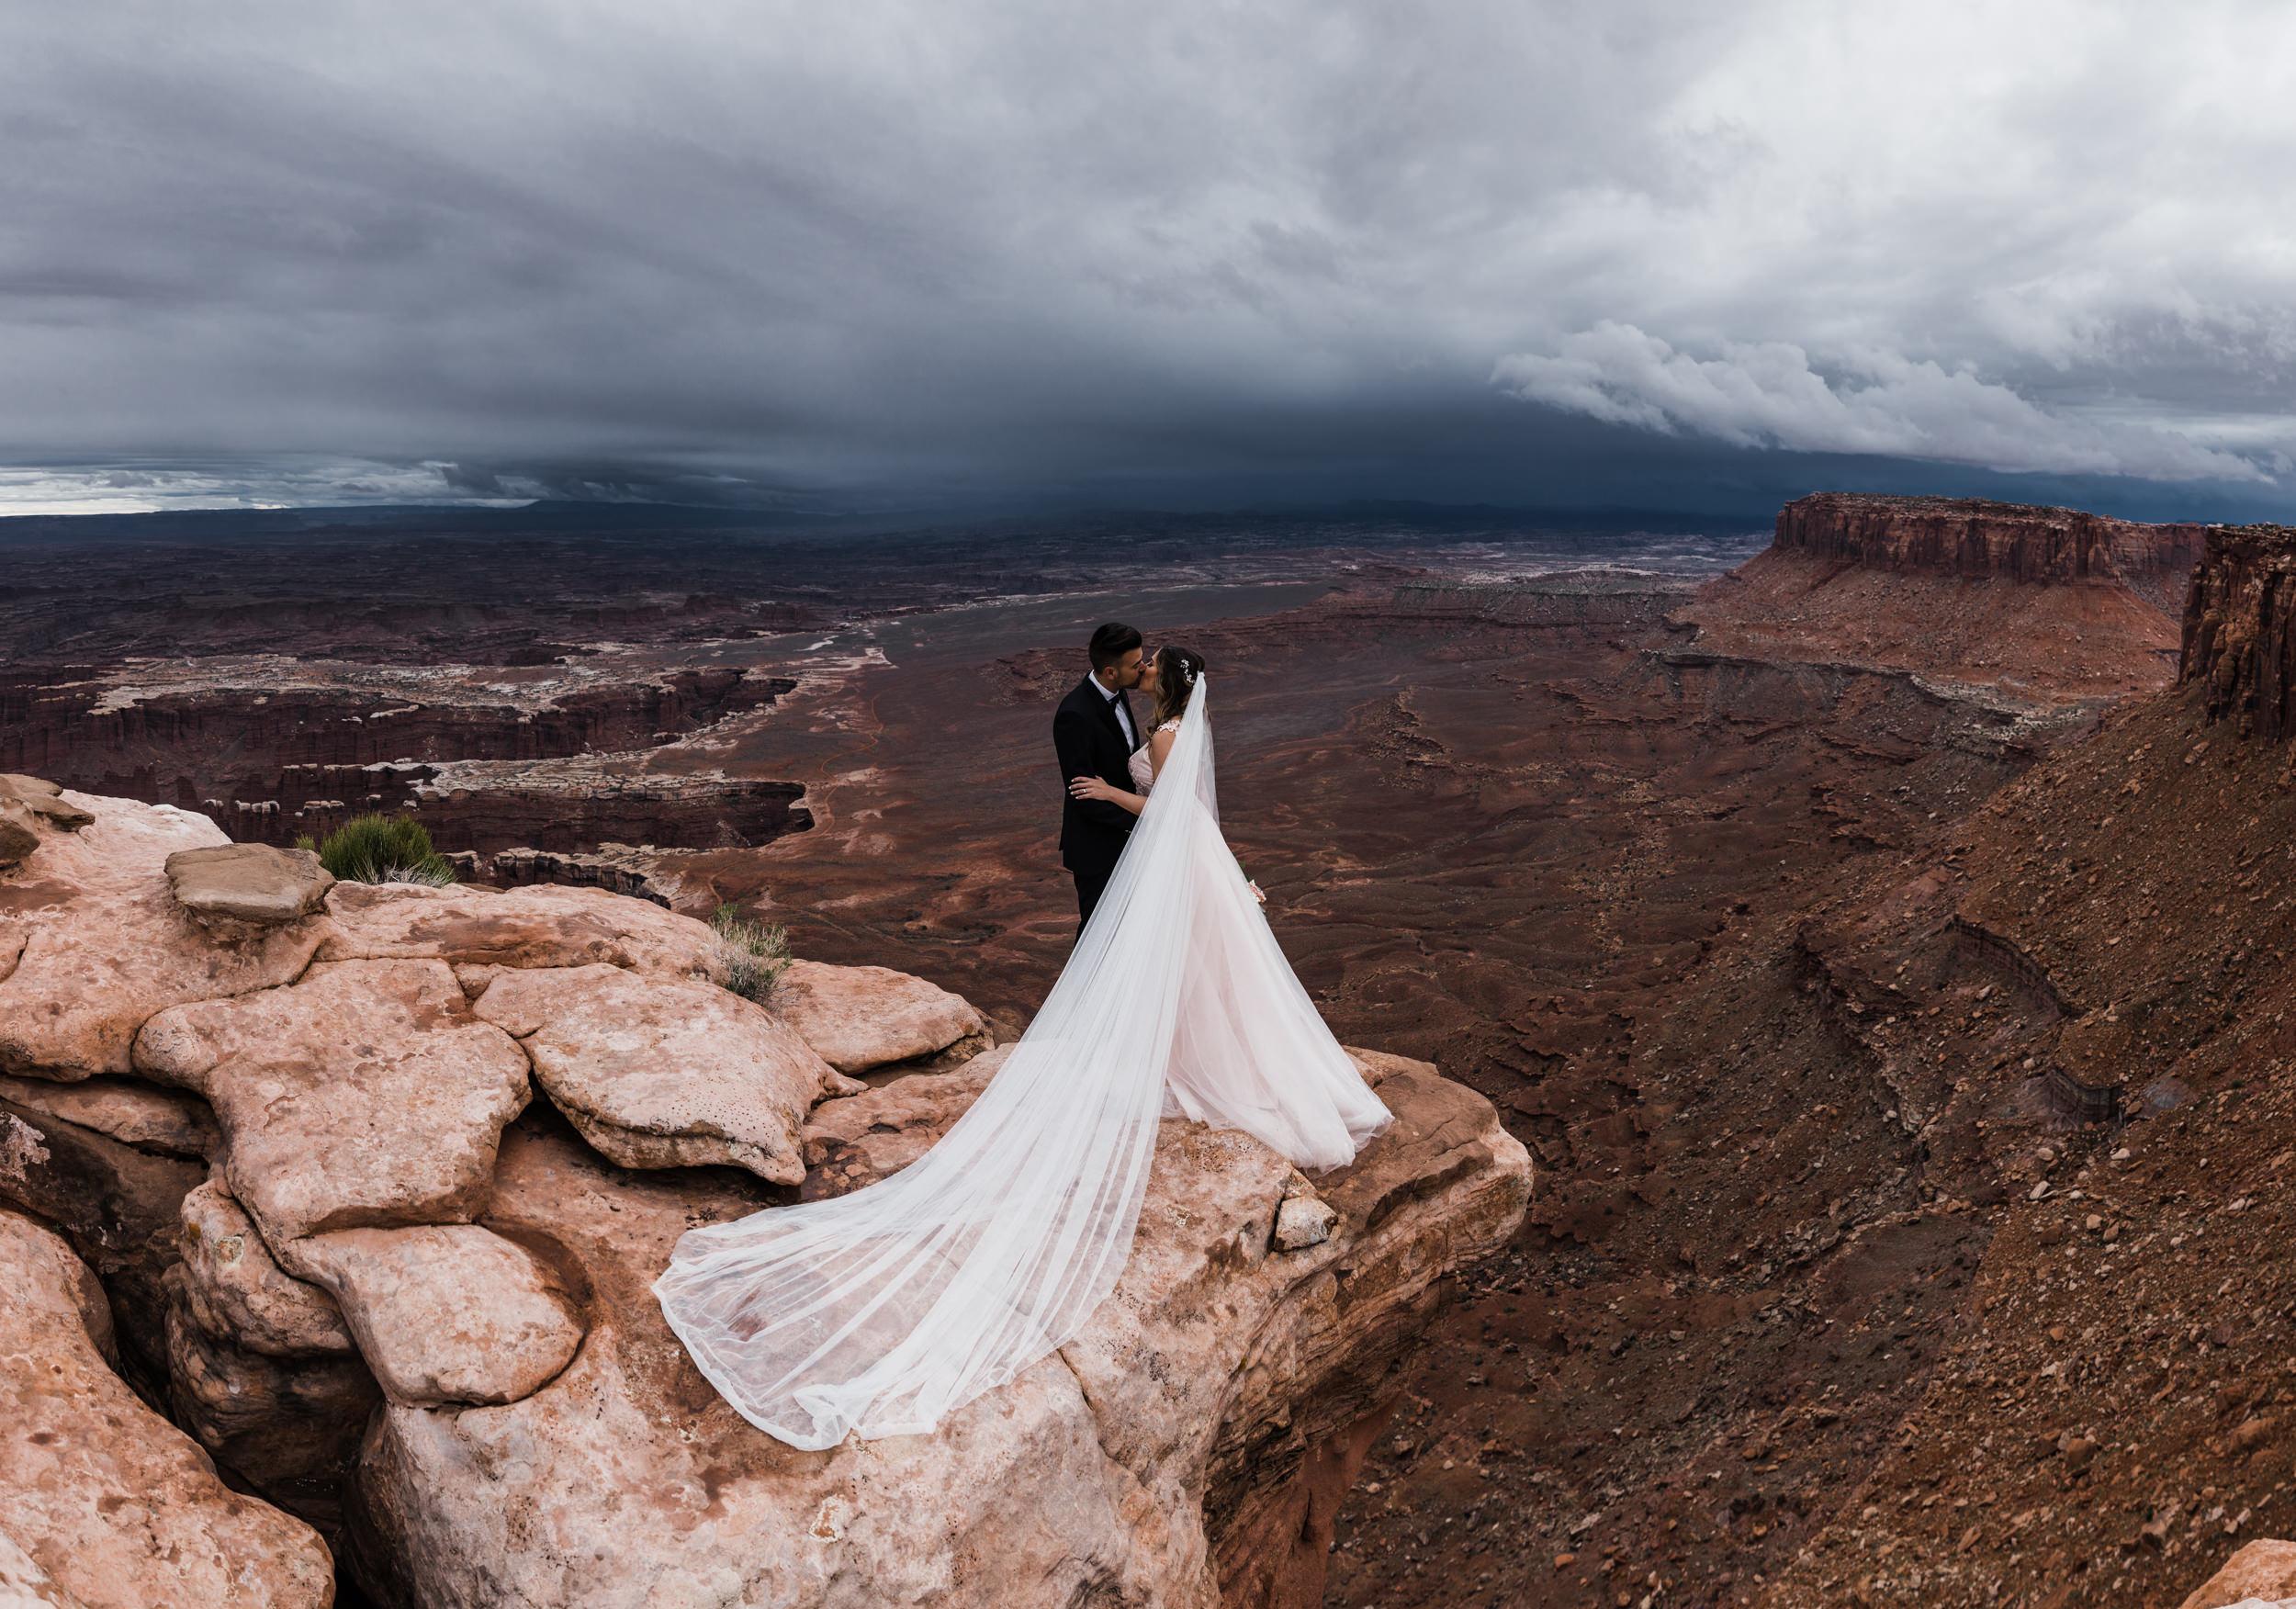 Hearnes-Elopement-Photography-Canyonlands-National-Park-Moab-Wedding-18.jpg